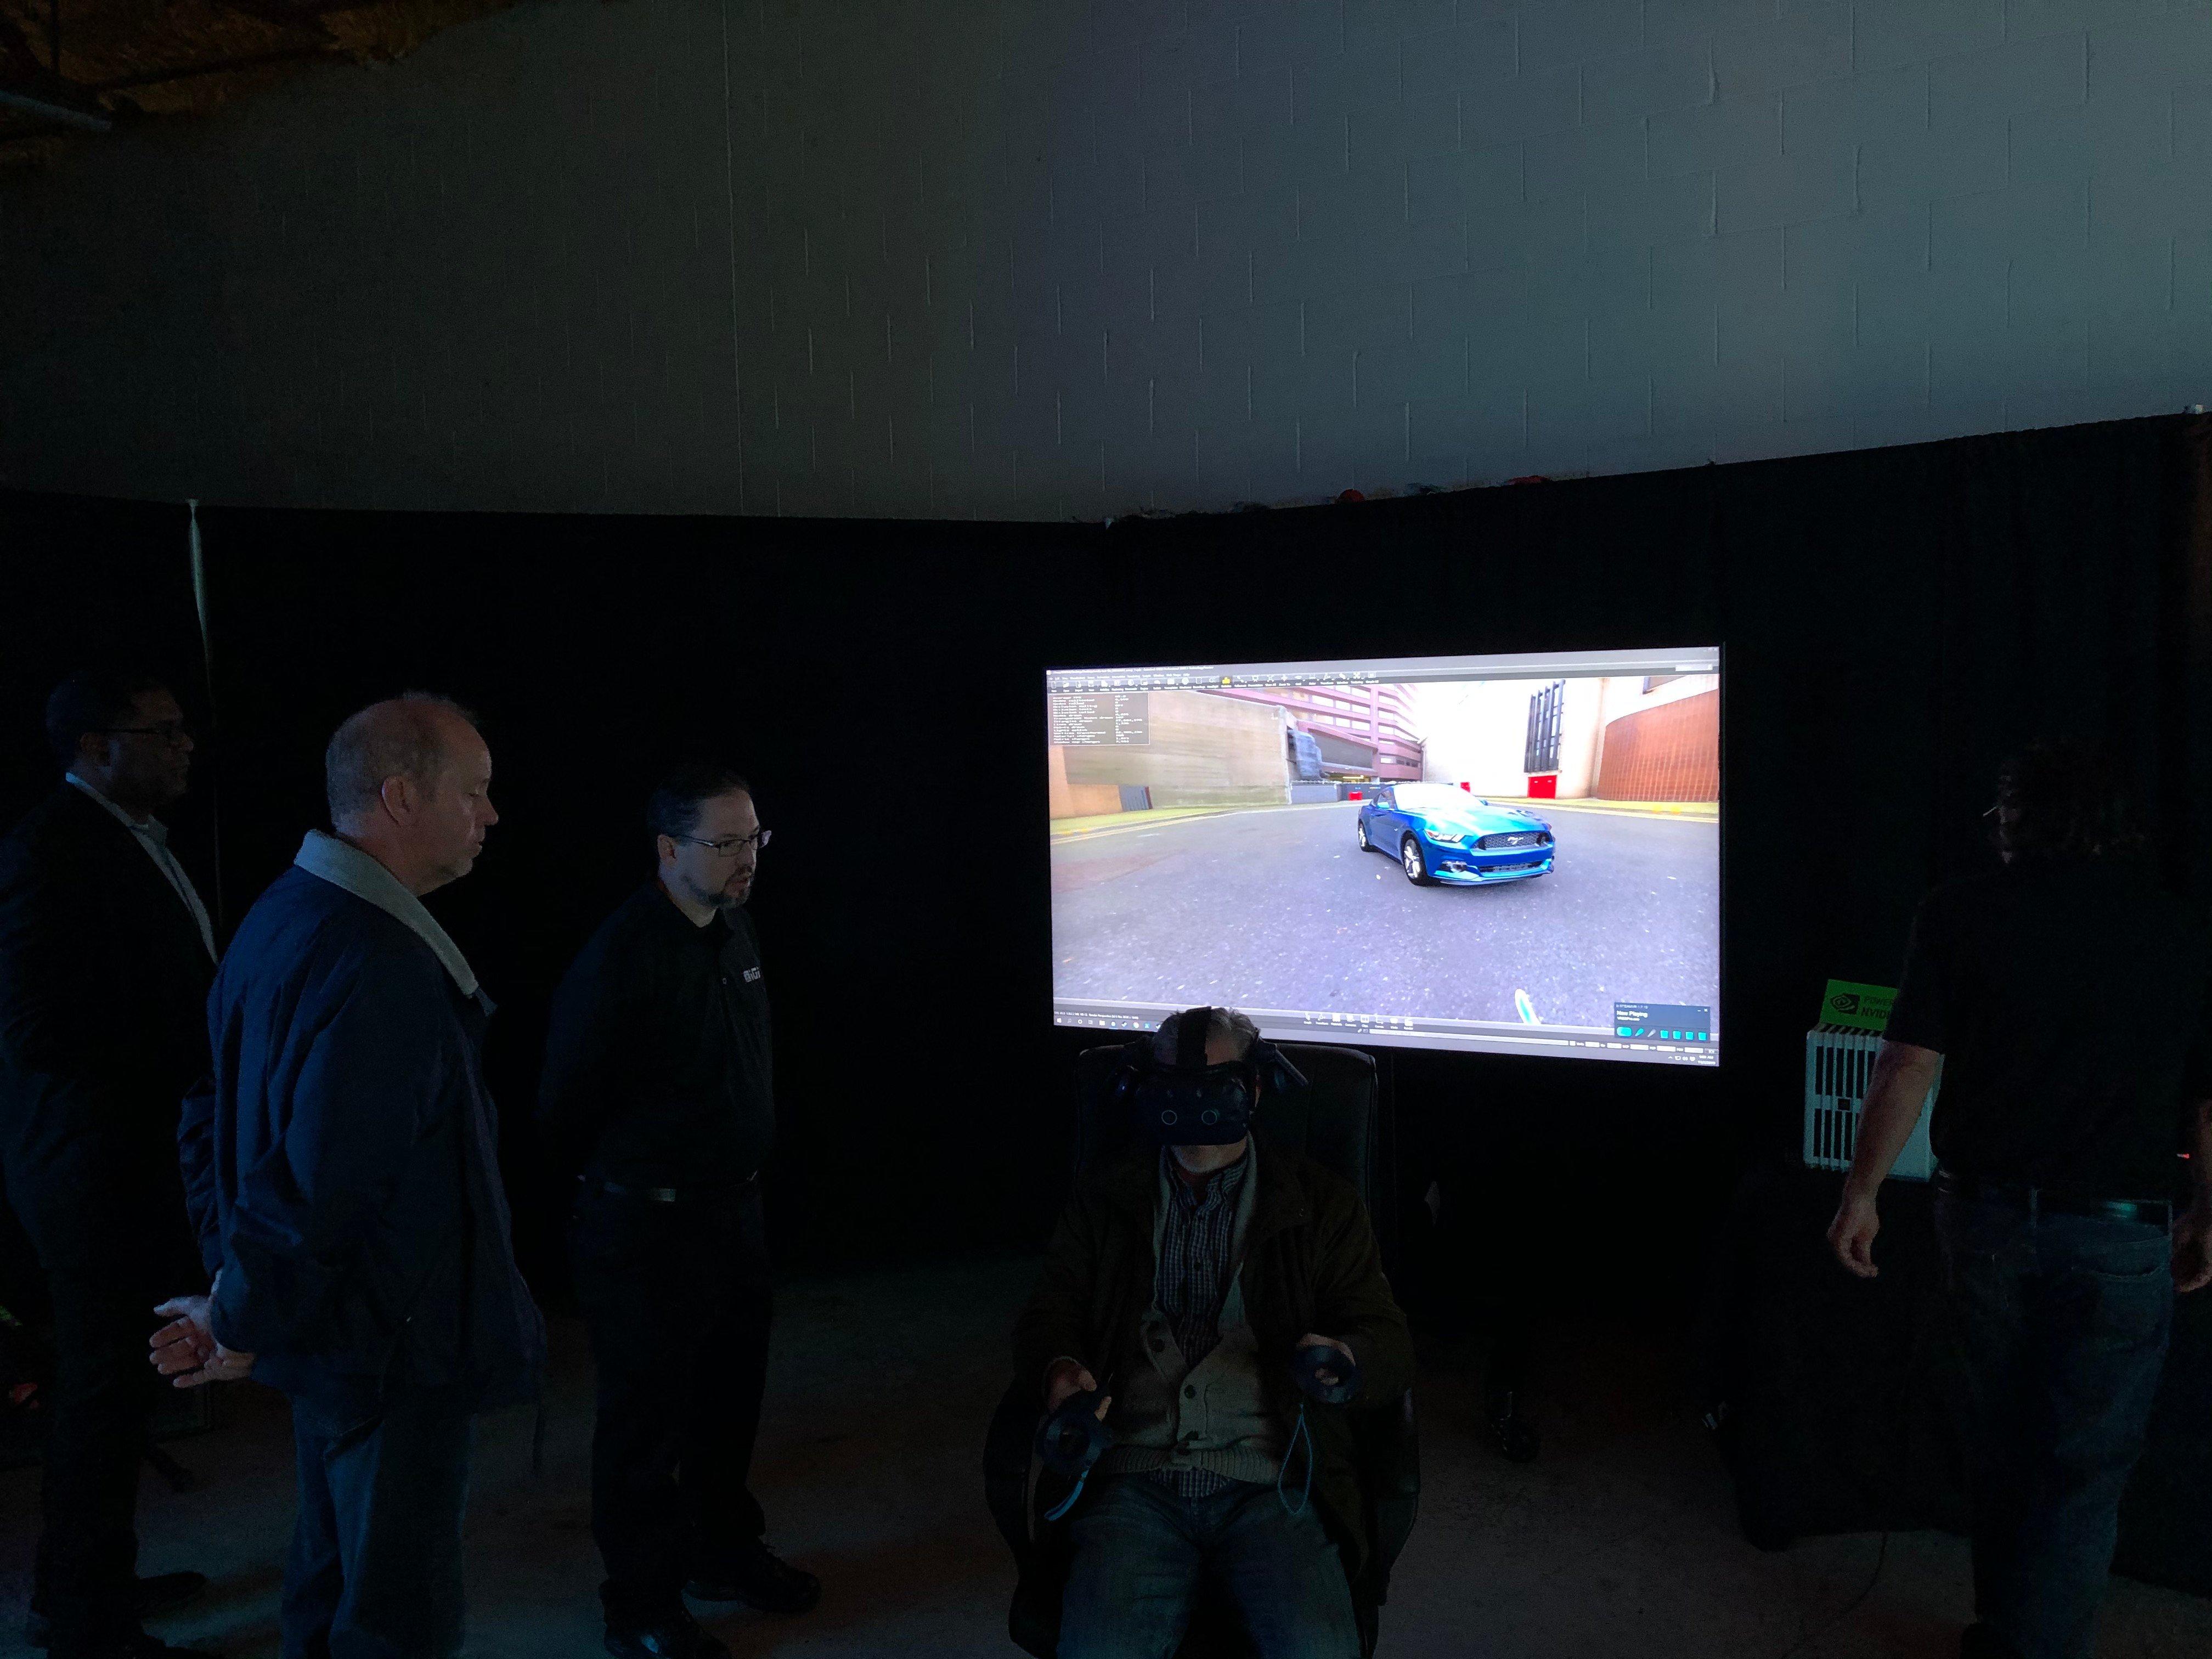 IGI-4K-Forum-HMD-and-Samsung-8K-monitor-1